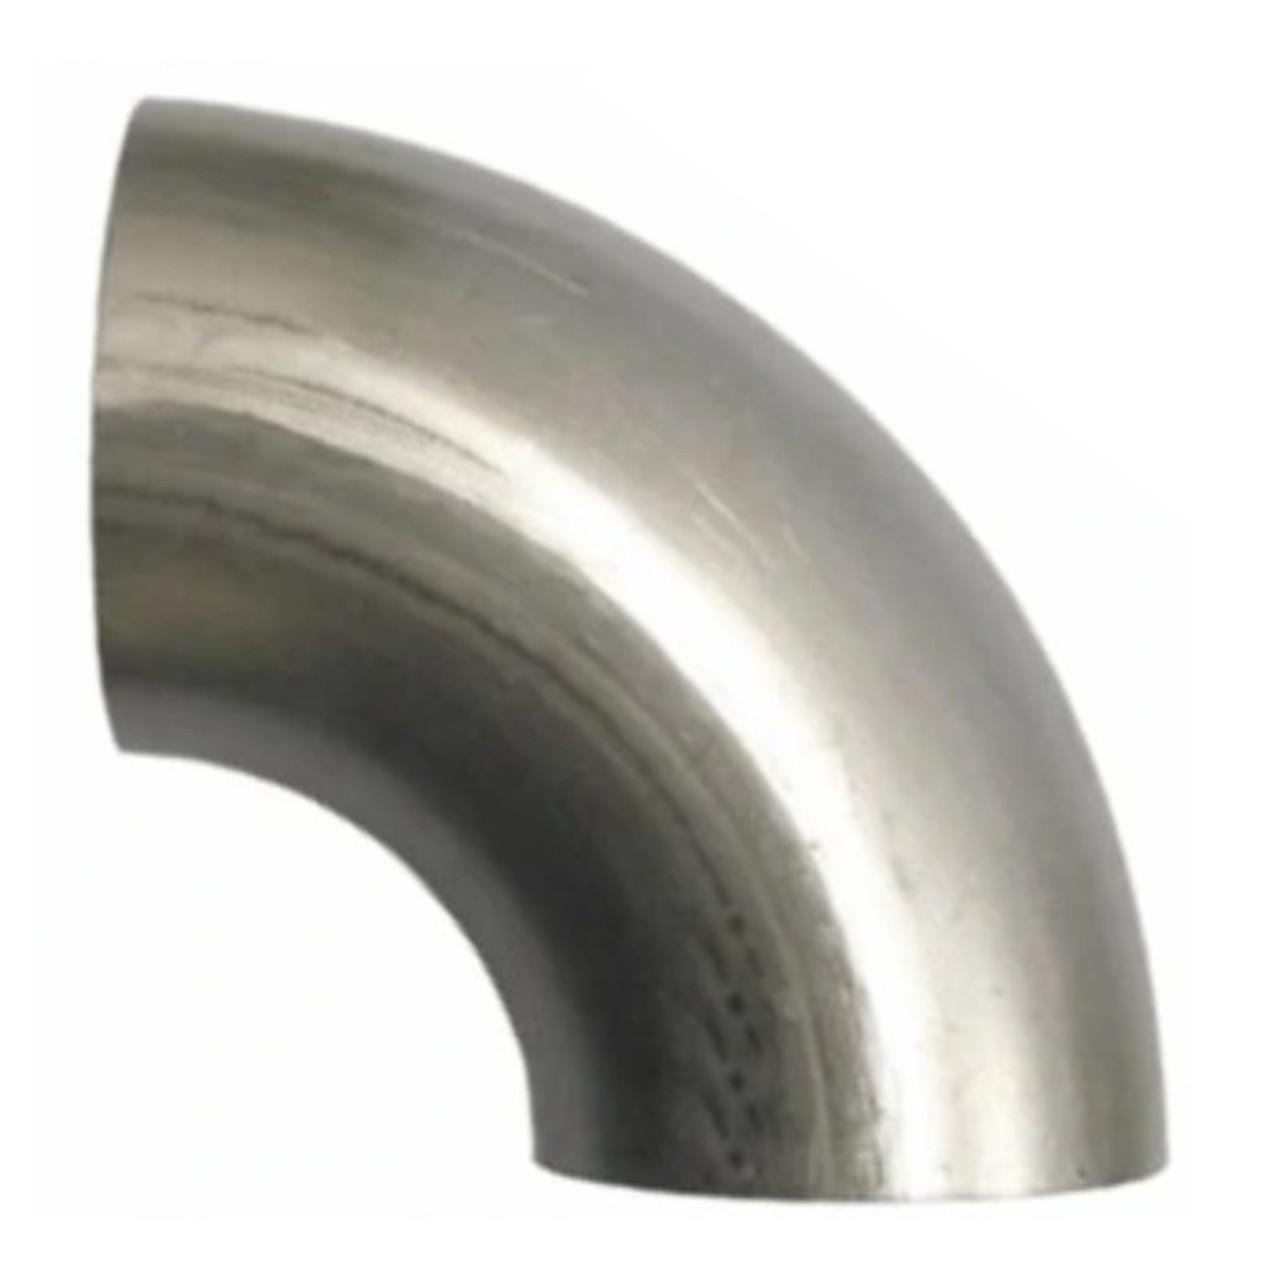 Exhaust Stainless Steel Pipe Bend Elbow 302 Stainless Steel Various Diameter